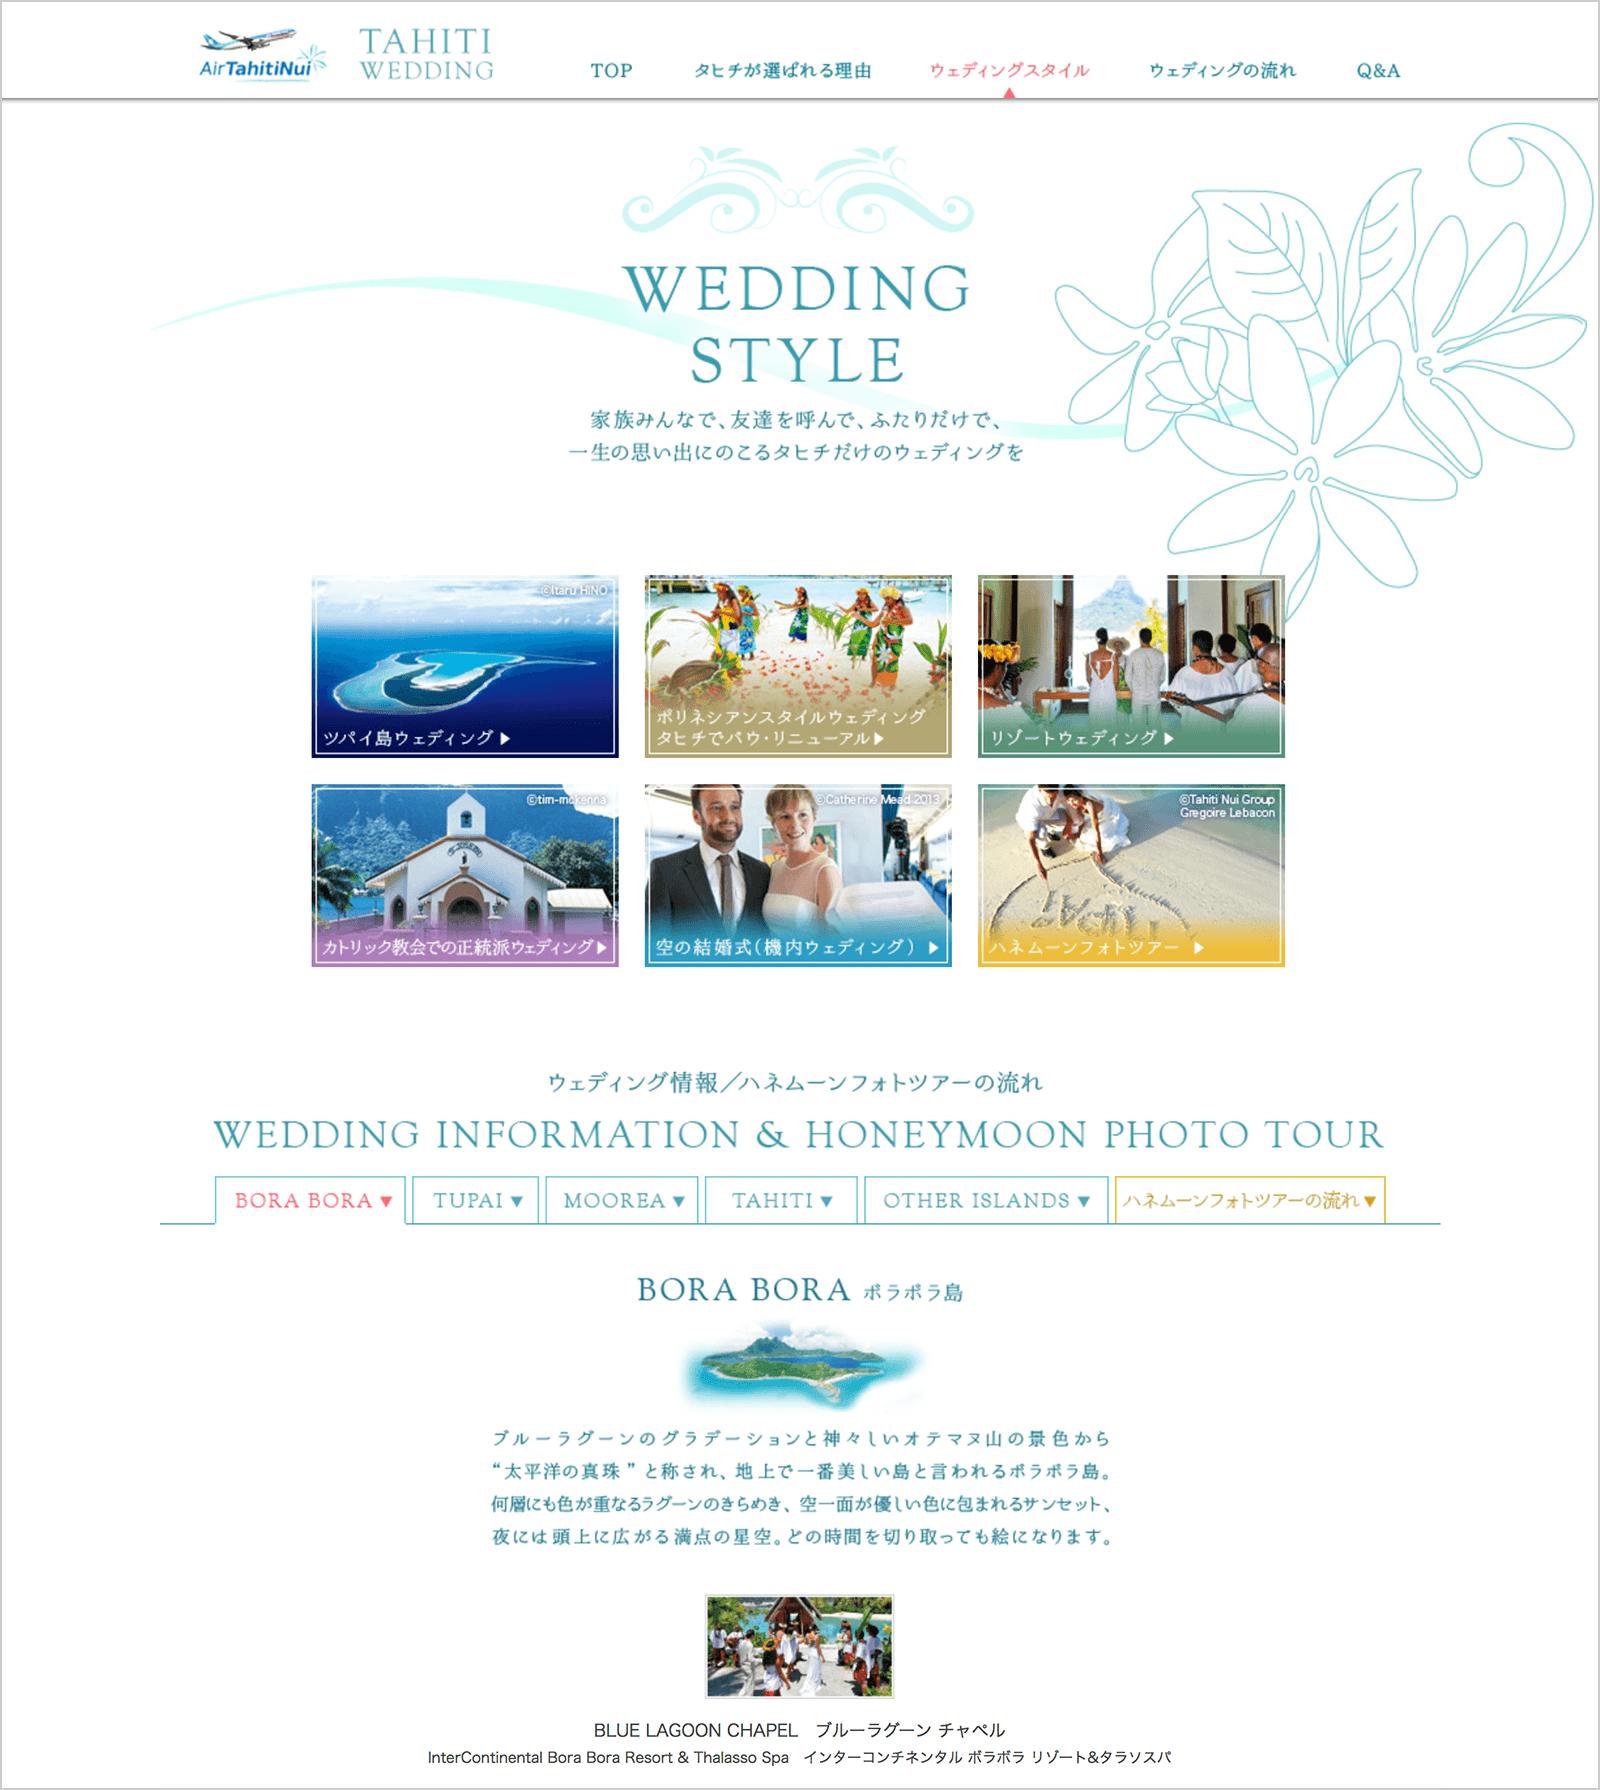 Air Tahiti Nui 「TAHITI WEDDING」プロモーションサイト